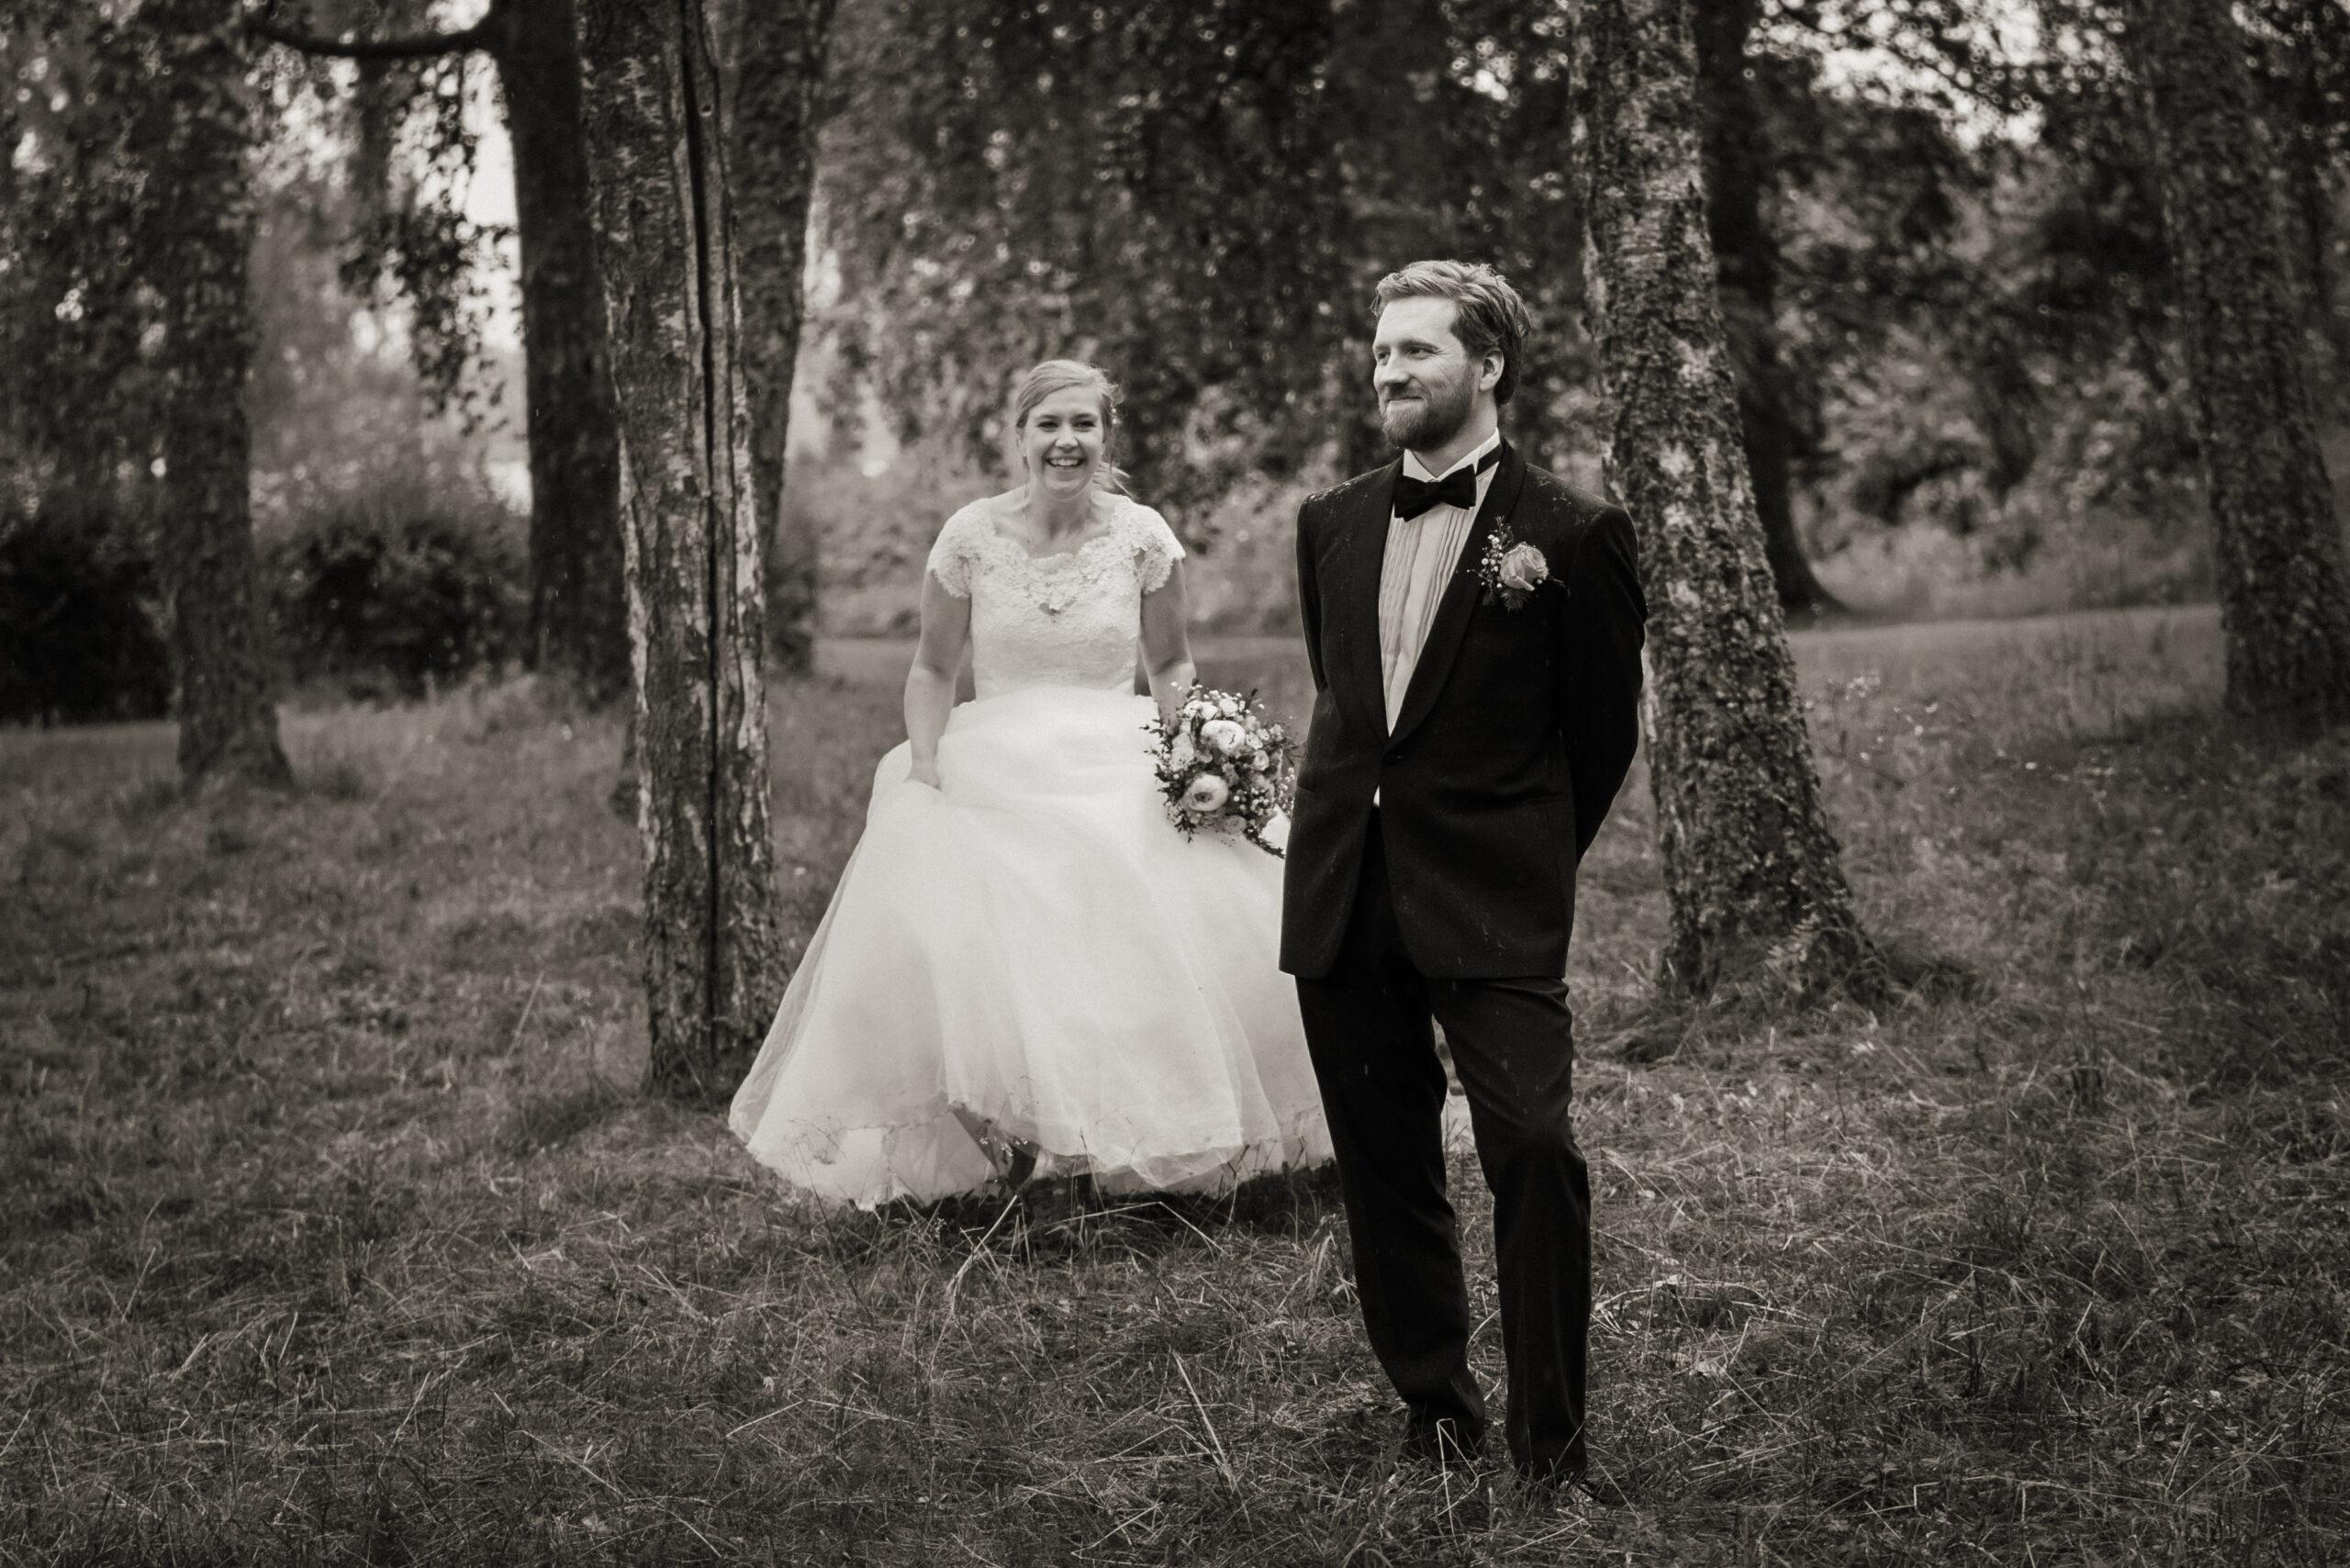 Bryllupsportretter i Rosanesparken